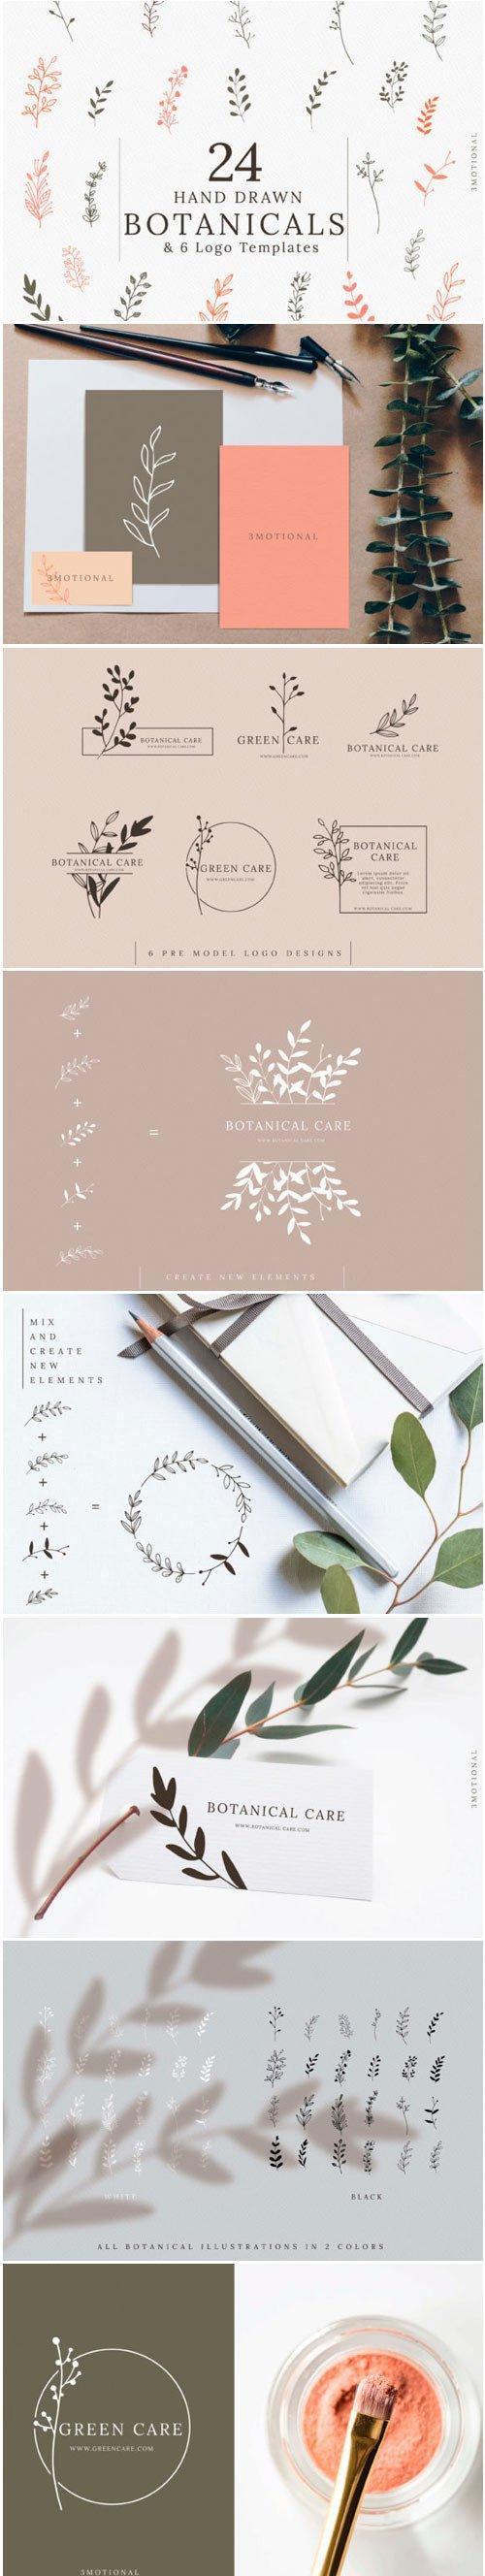 Hand-drawn Botanical Illustrations 1574363